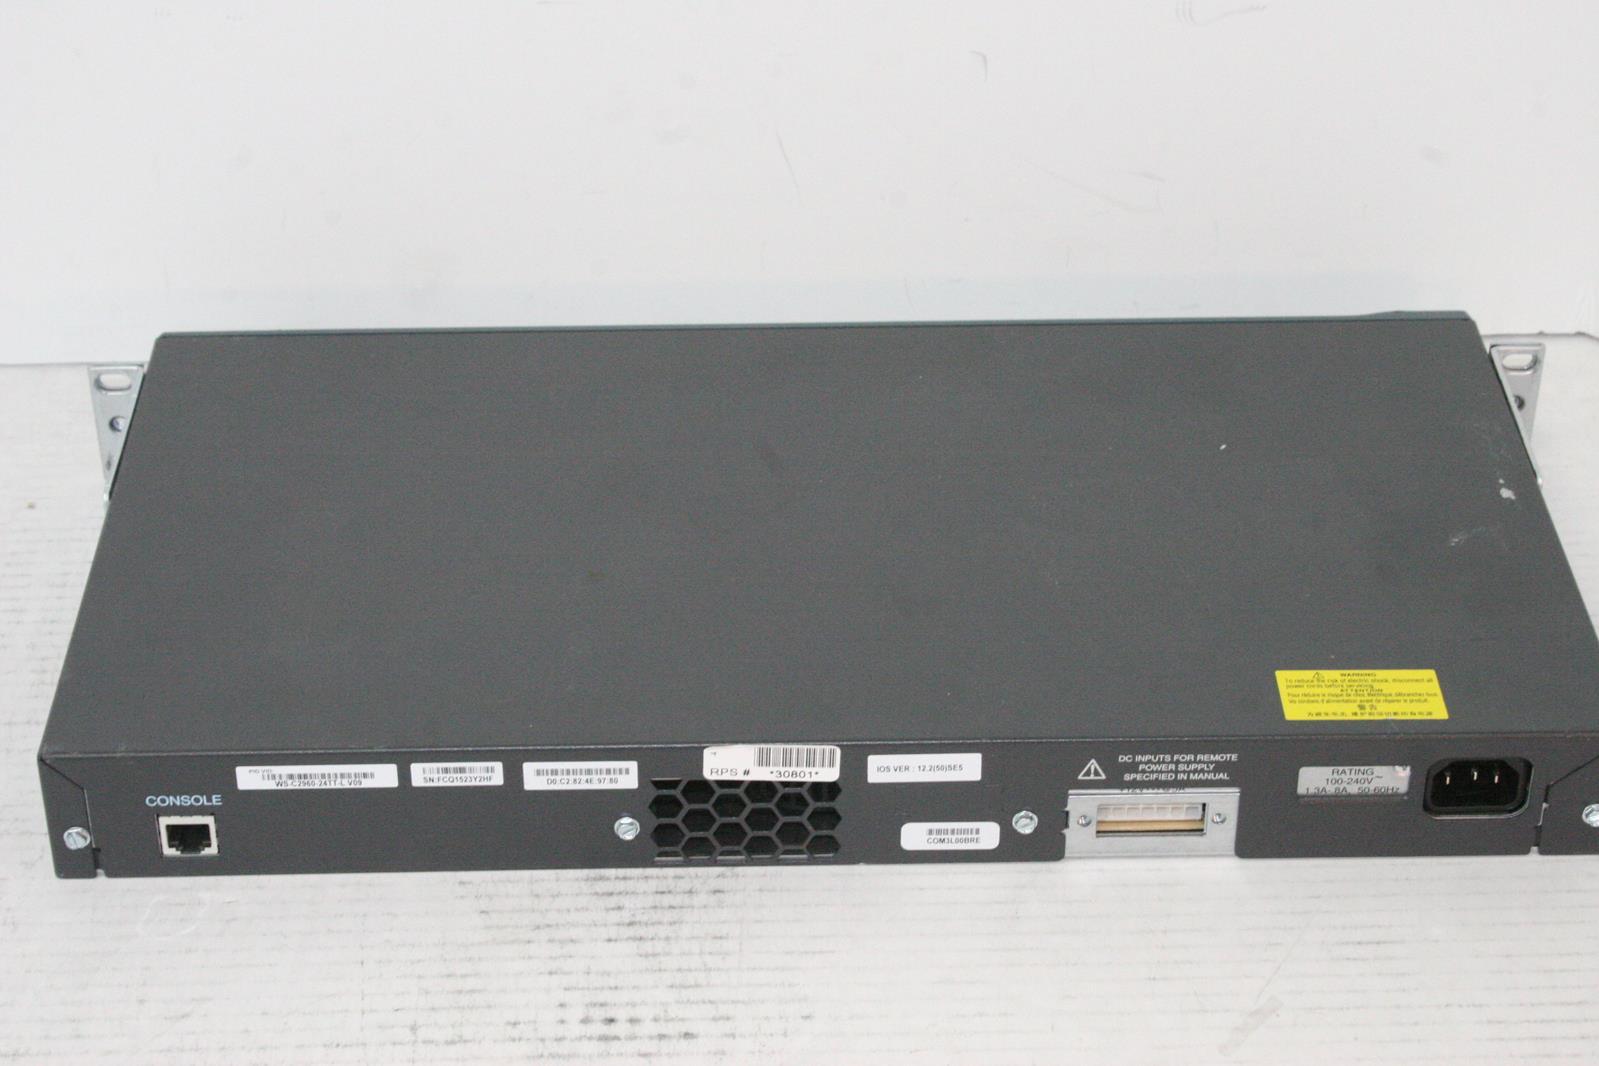 Cisco Ws C2960 24tt L 24 Port Managed Network Switch Ebay Wsc296024ttl Product Details